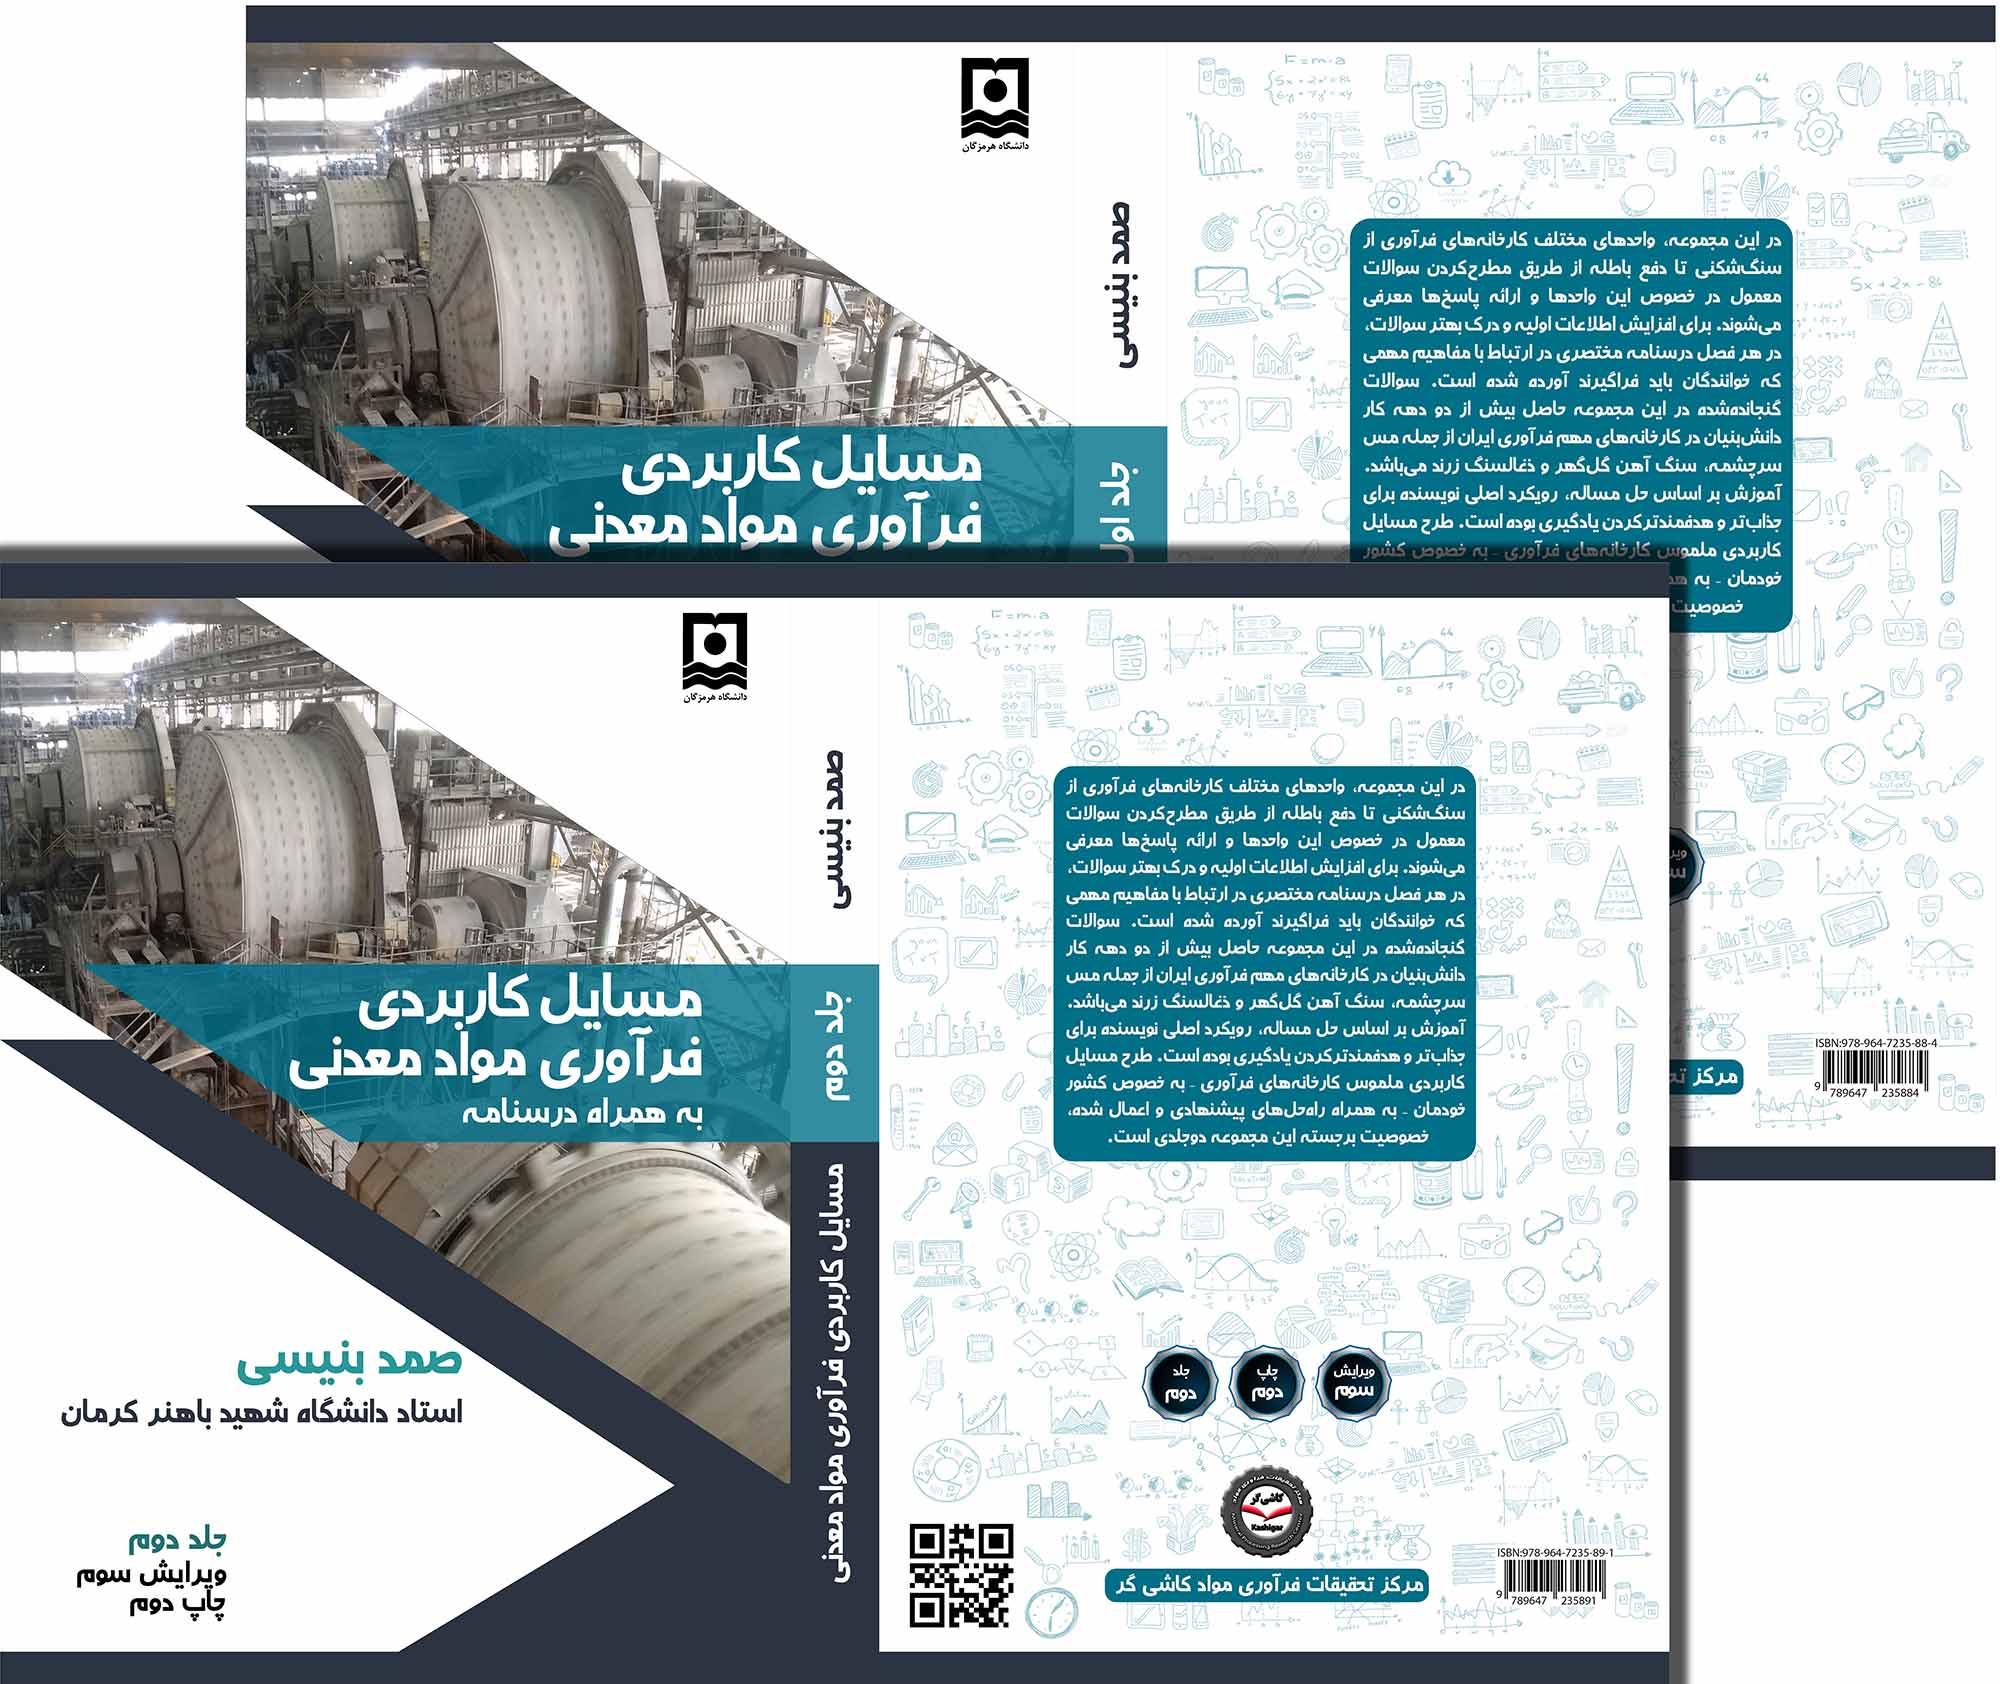 انتشار مجدد دوره دوجلدی کتاب مسائل کاربردی فرآوری مواد معدنی - پاییز ۱۳۹۸